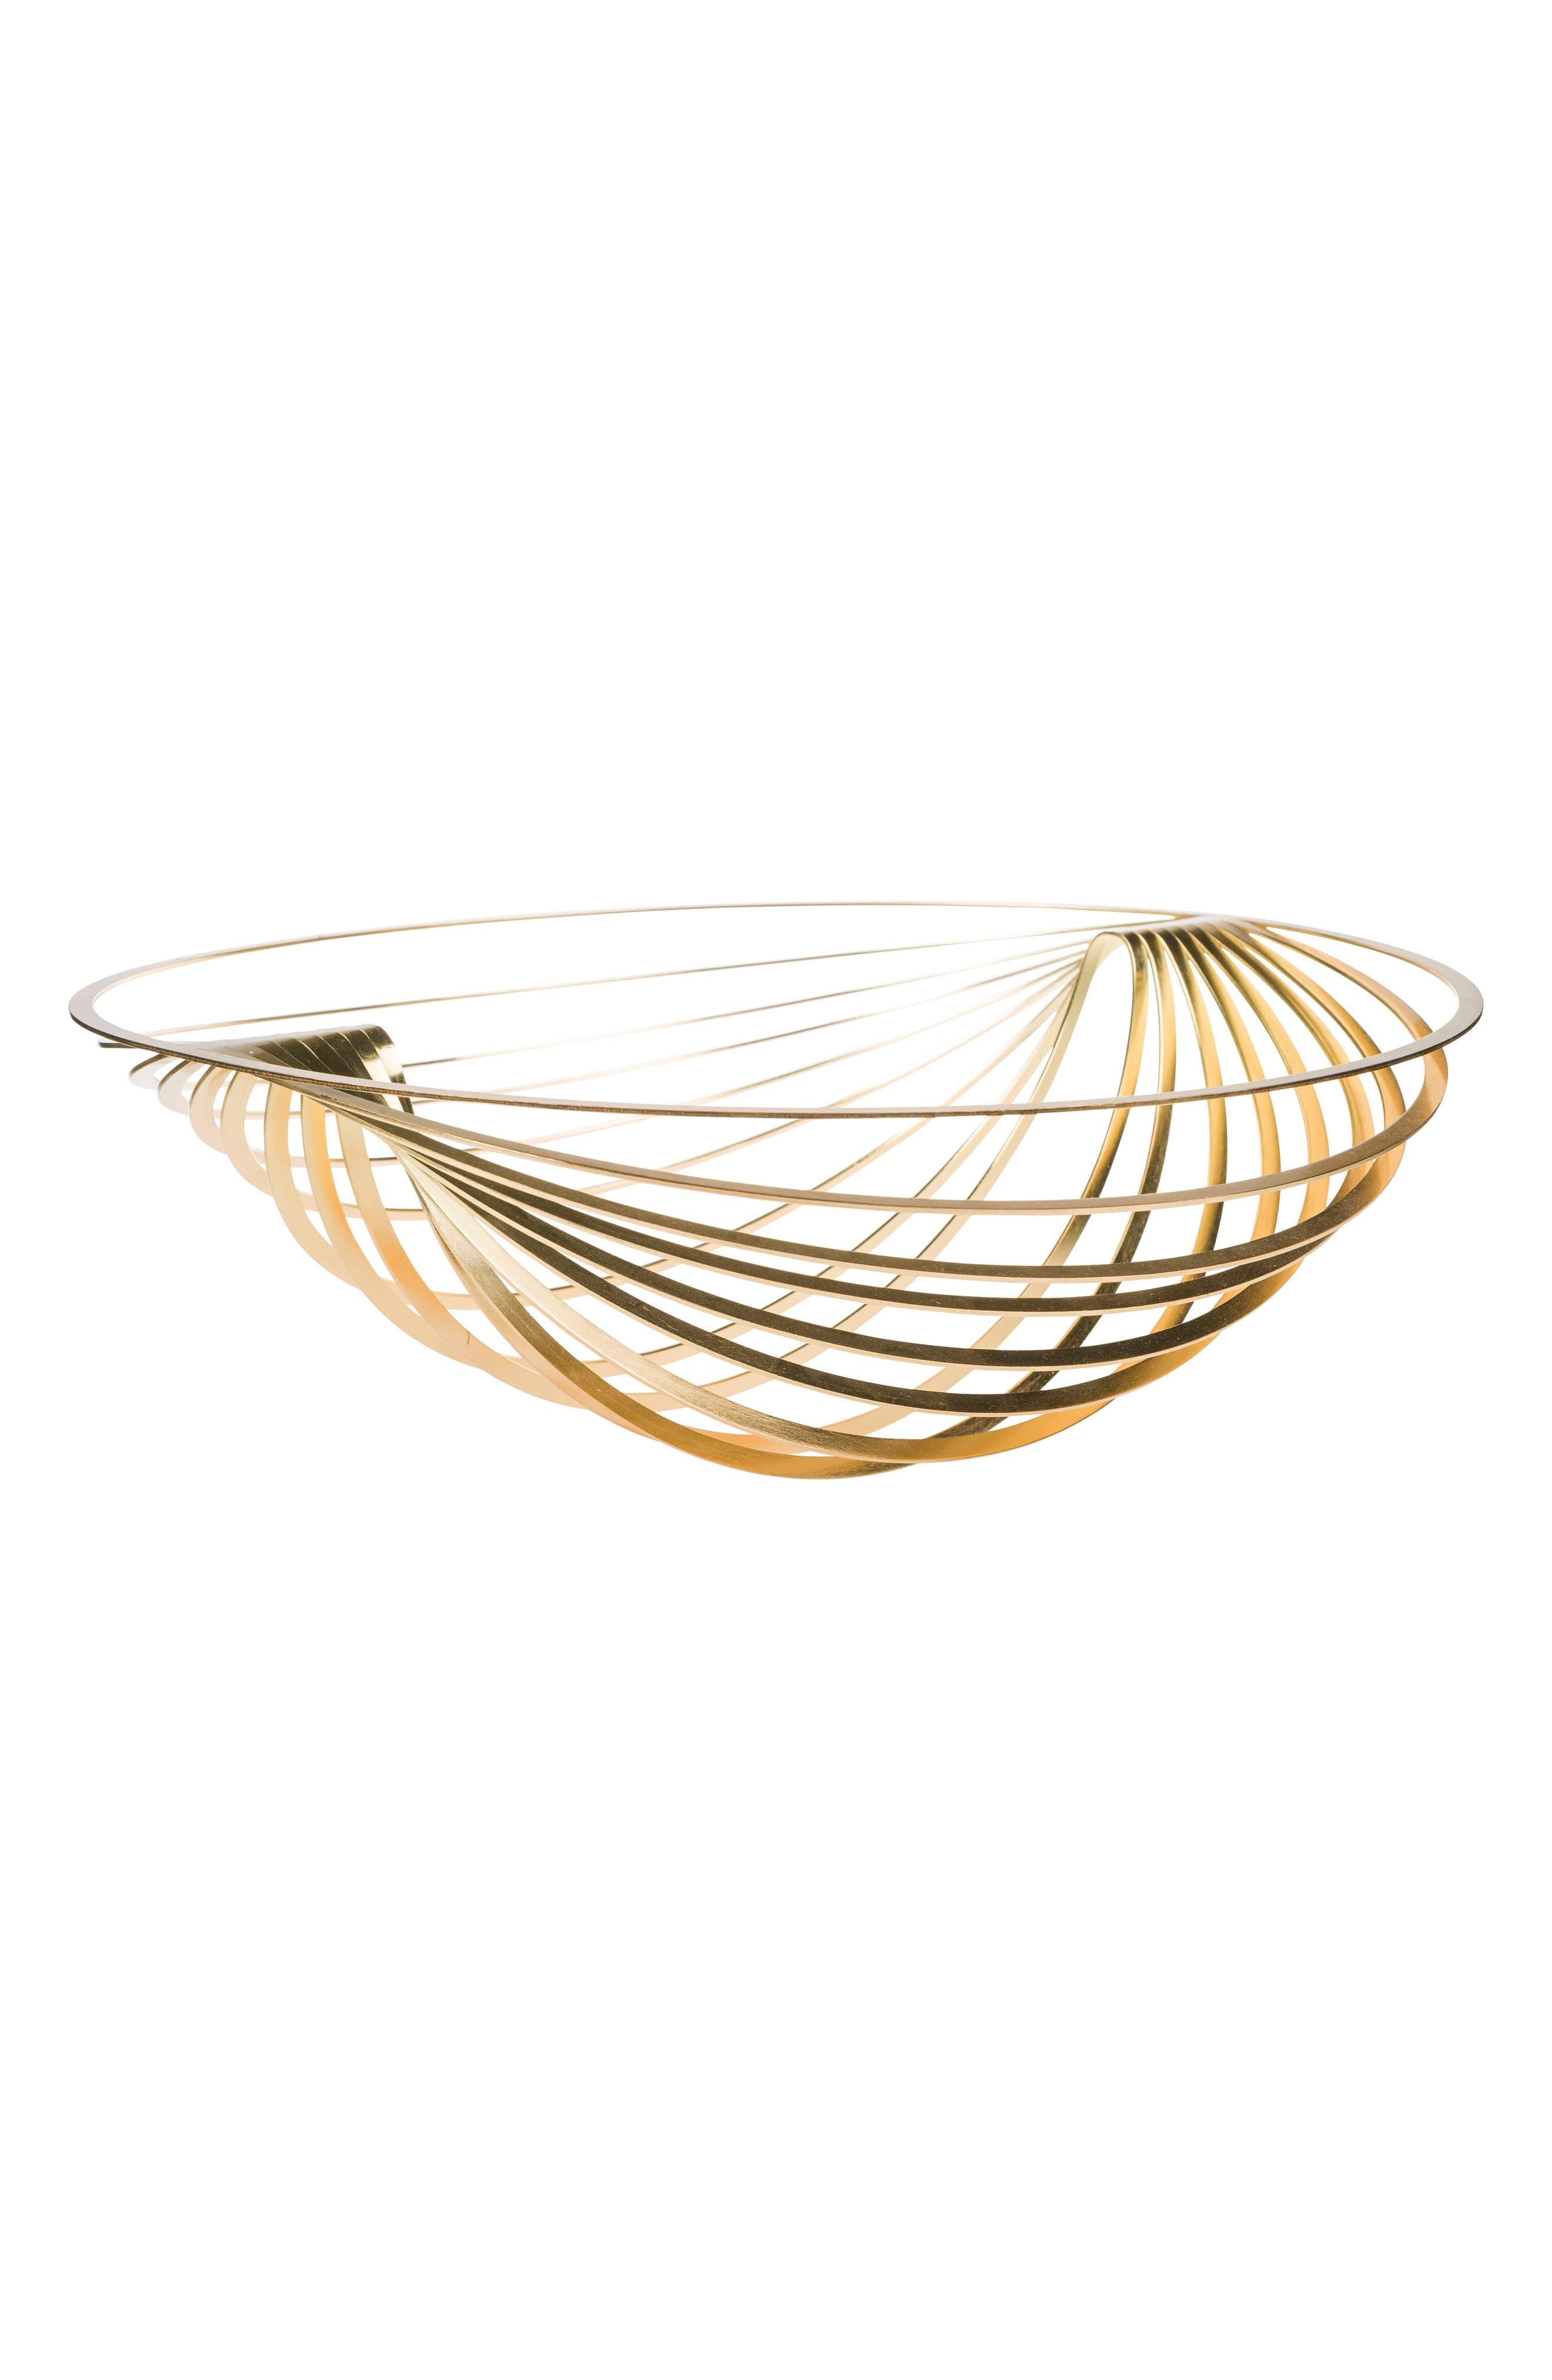 Main Image - Eightmood Rocking Decorative Bowl